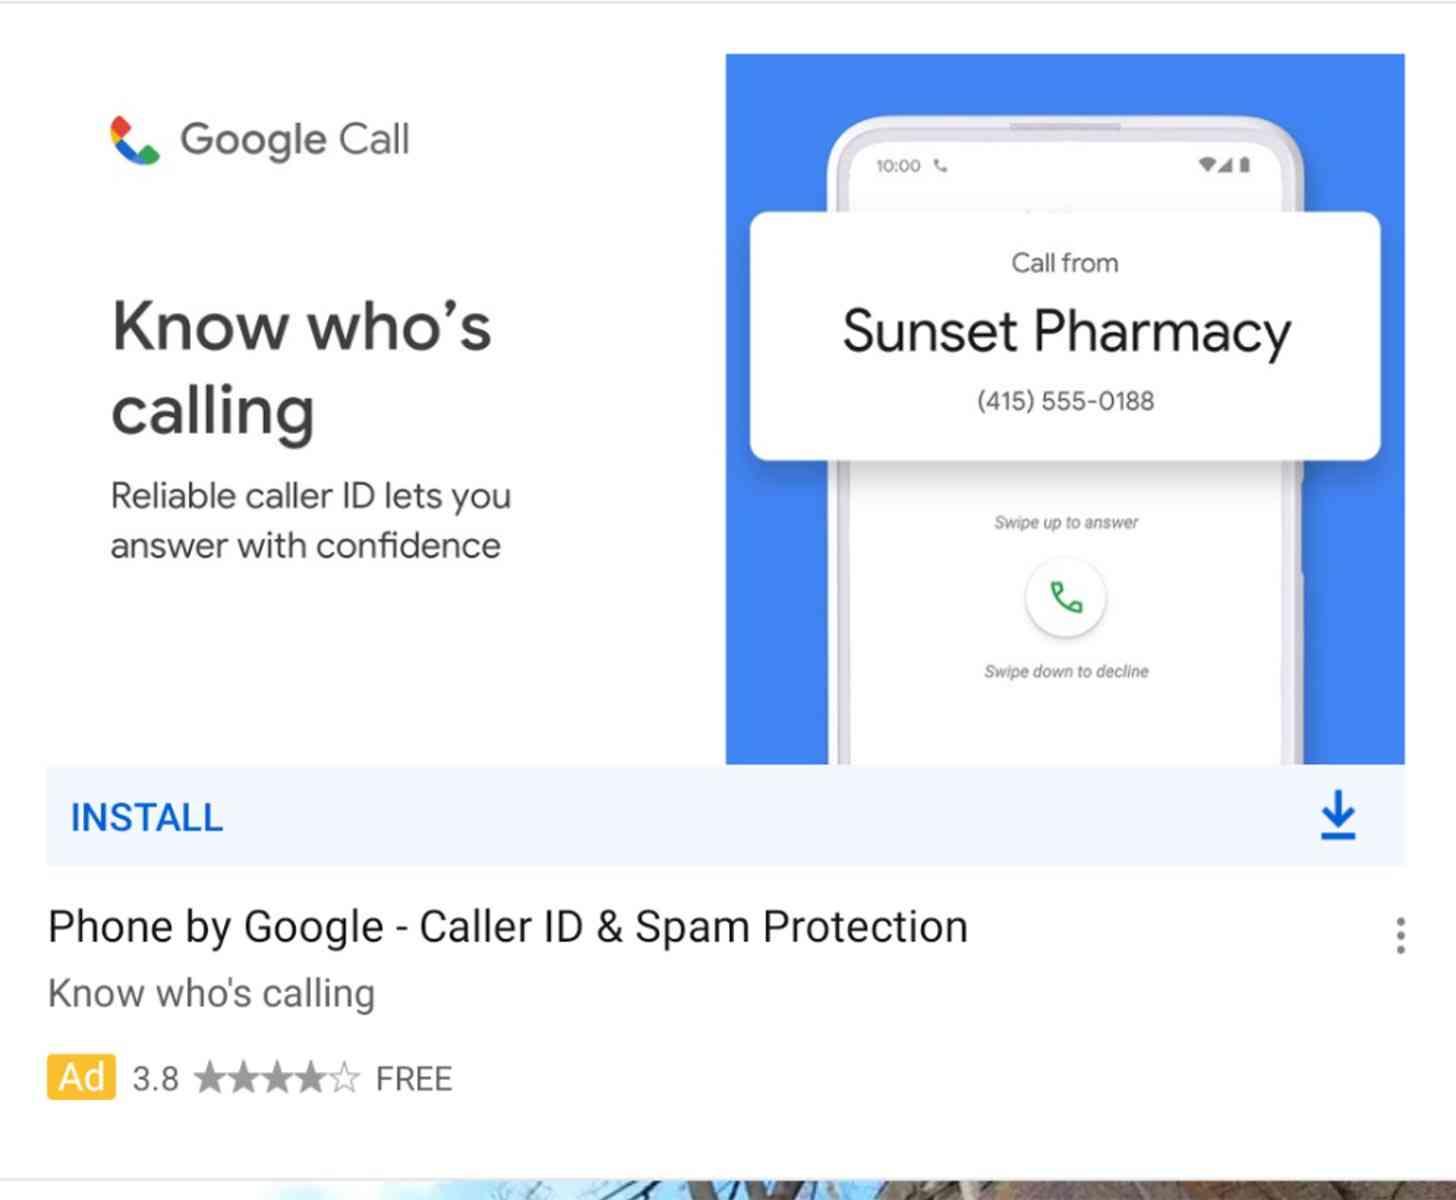 Google Call new icon leak